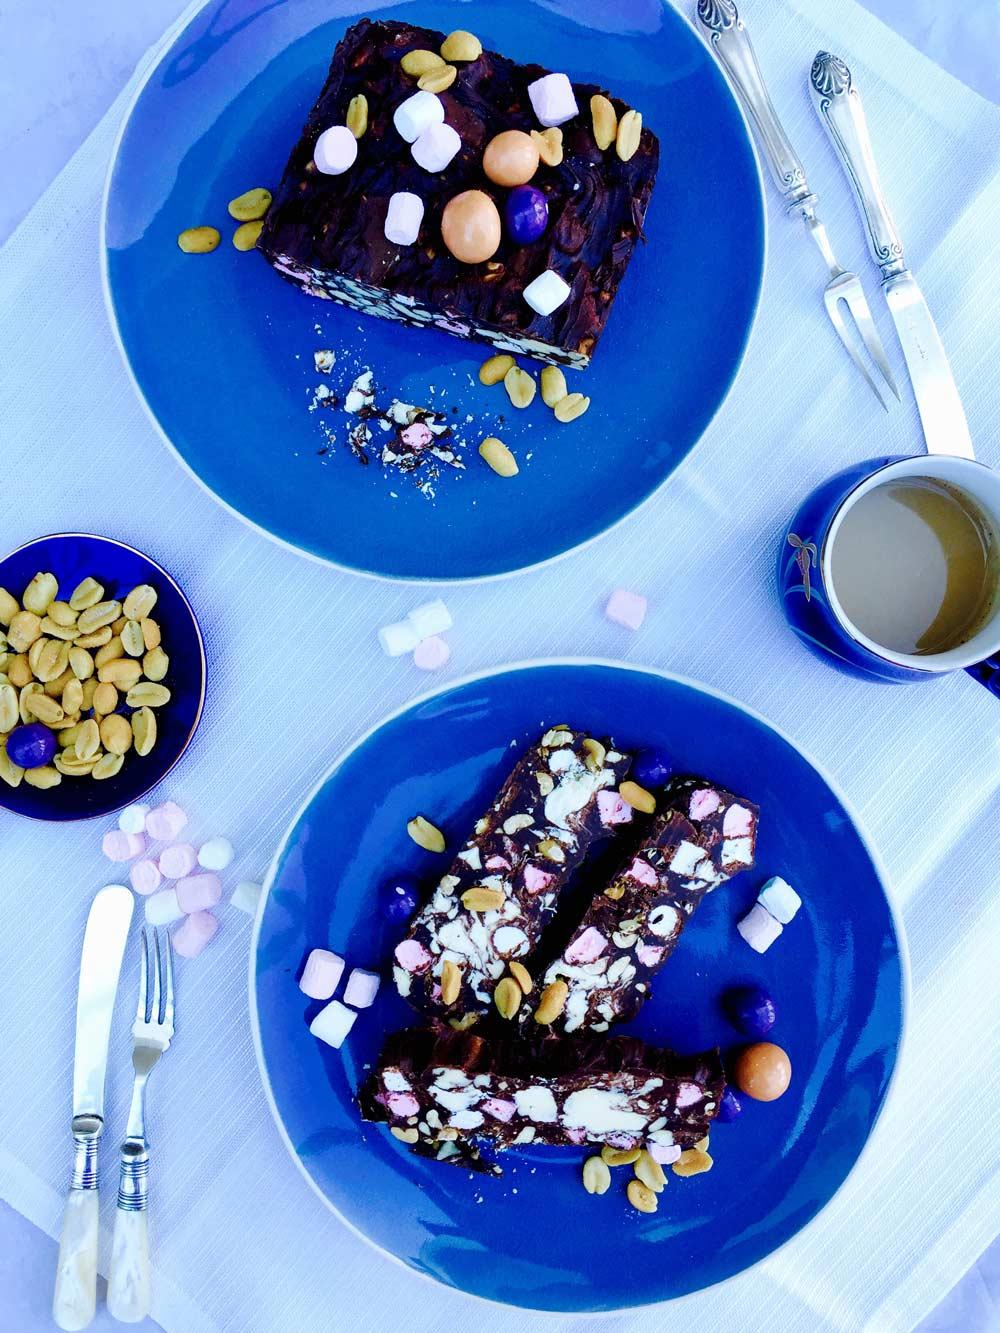 marbled chocolate, mini marshmallows and peanut bars